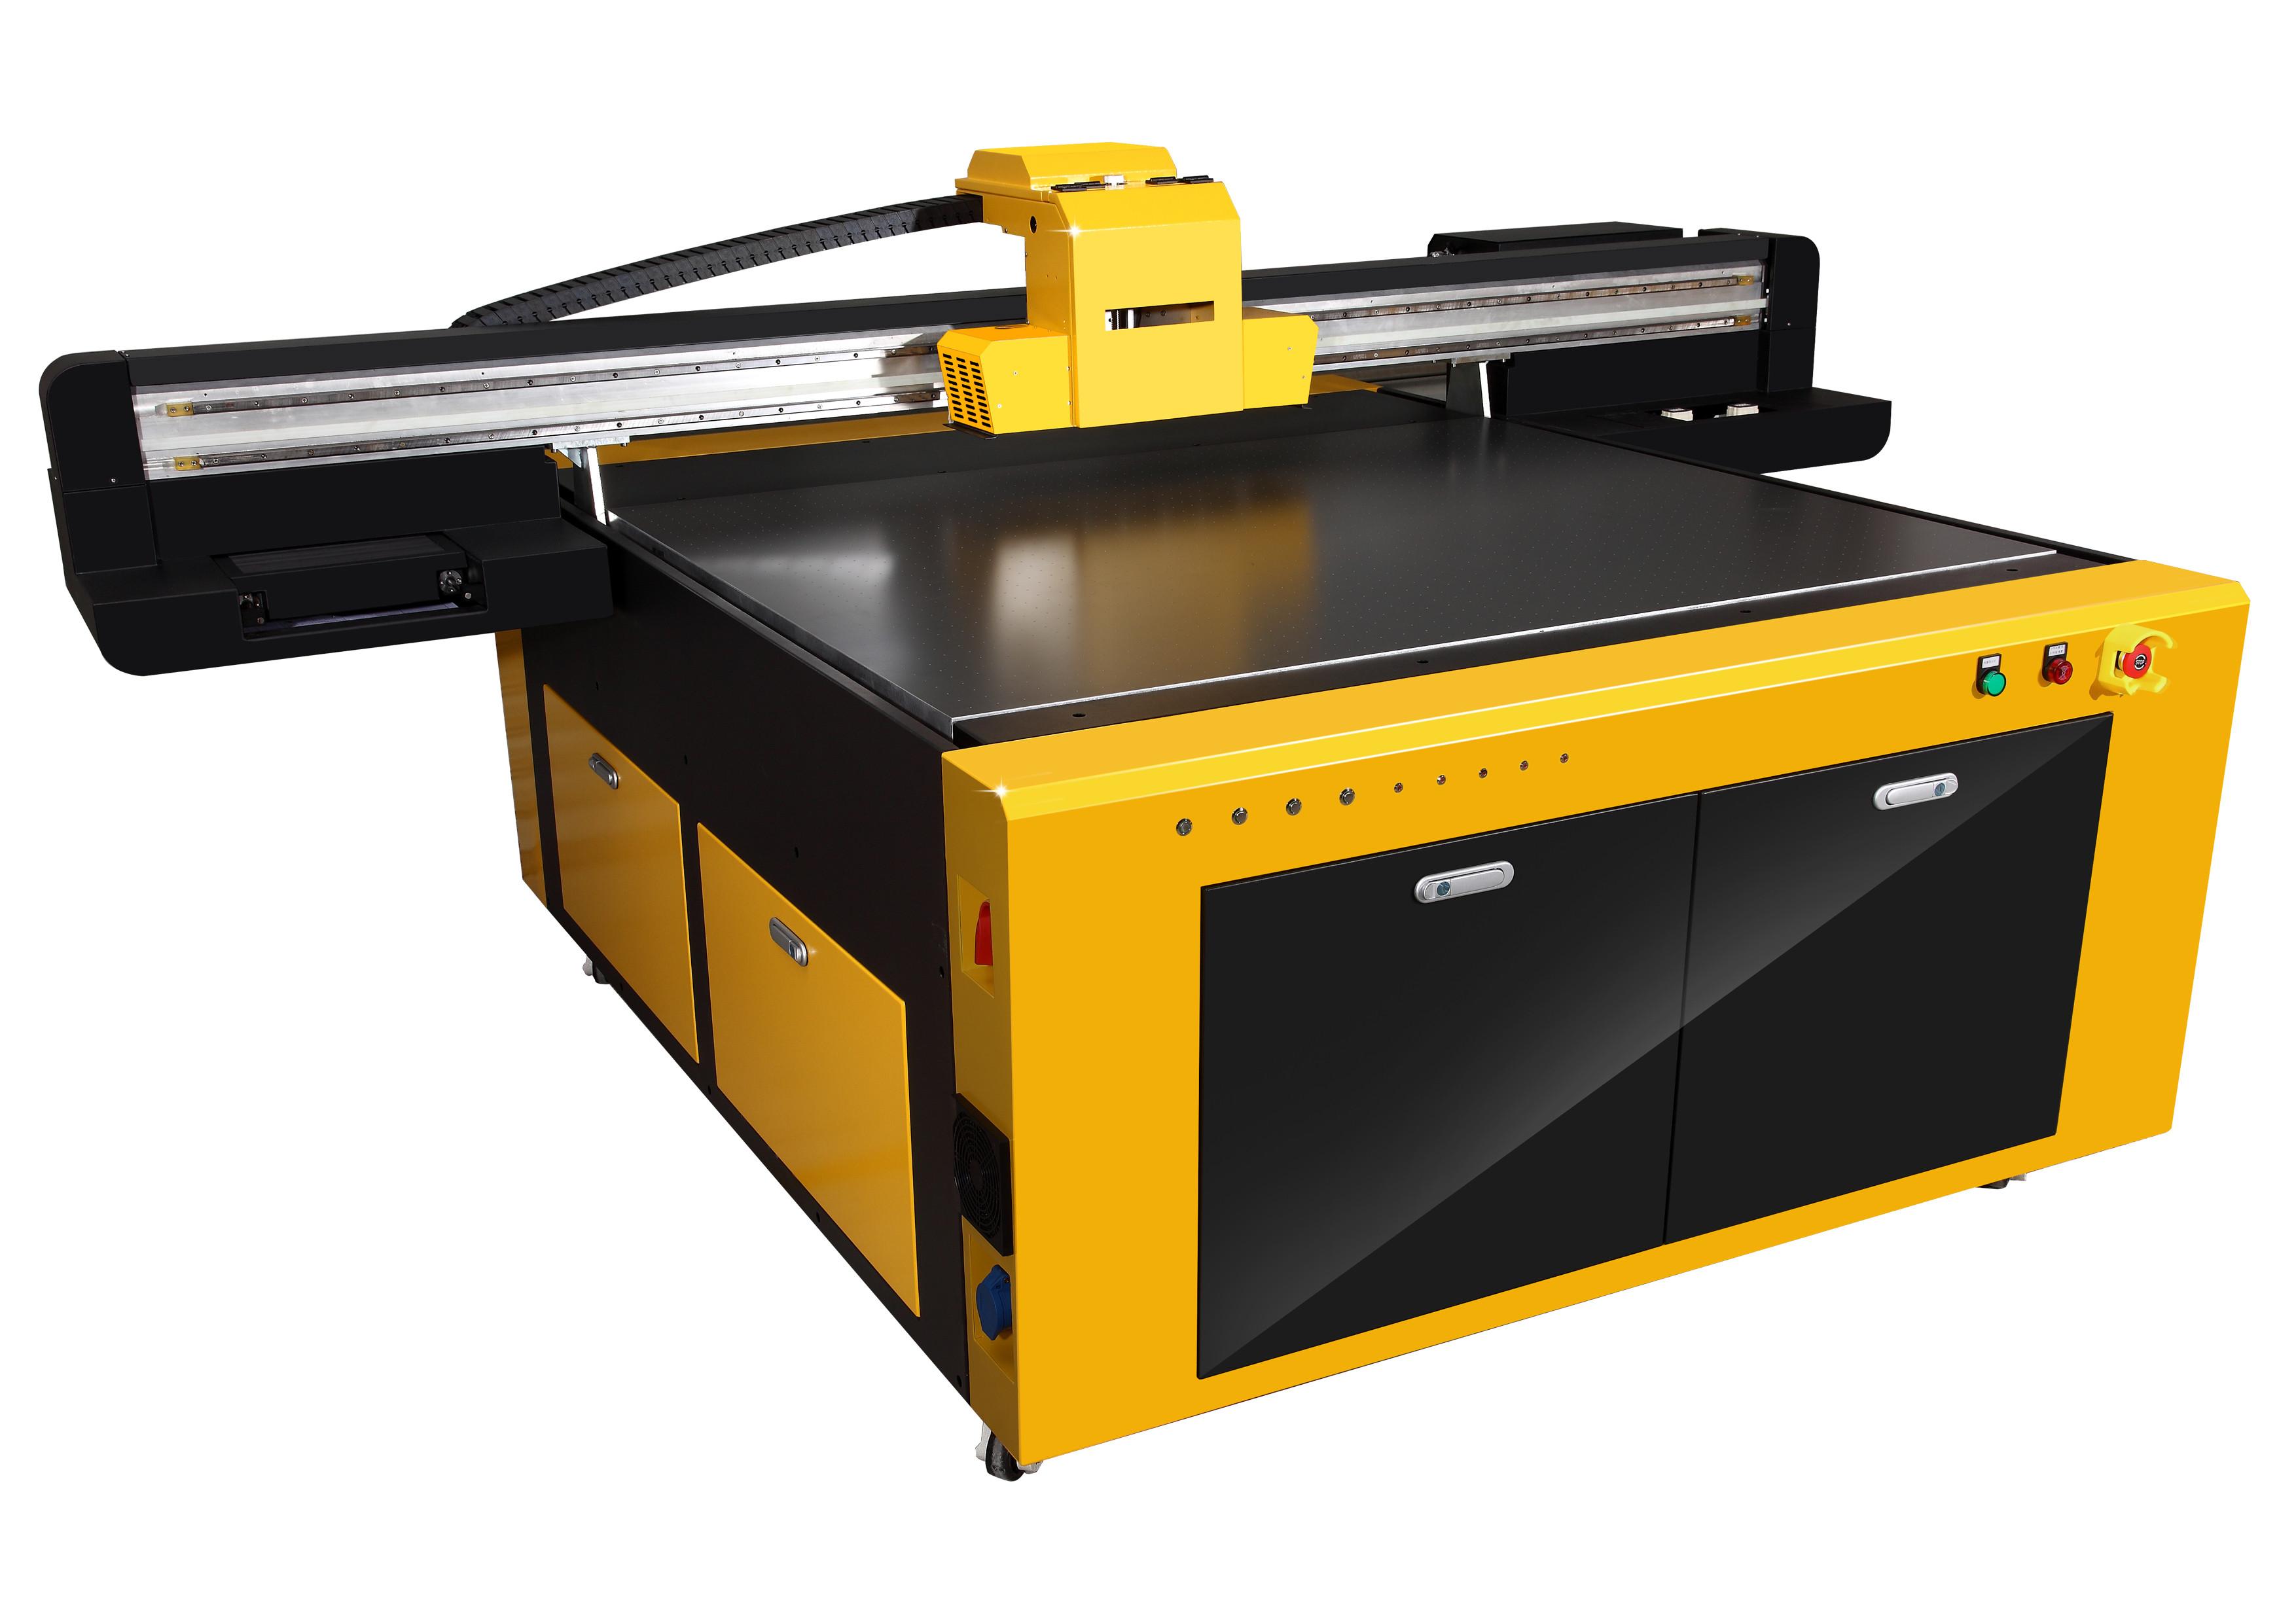 flatbed uv printing machine for kd board plexiglas acrylic sheet glass. Black Bedroom Furniture Sets. Home Design Ideas